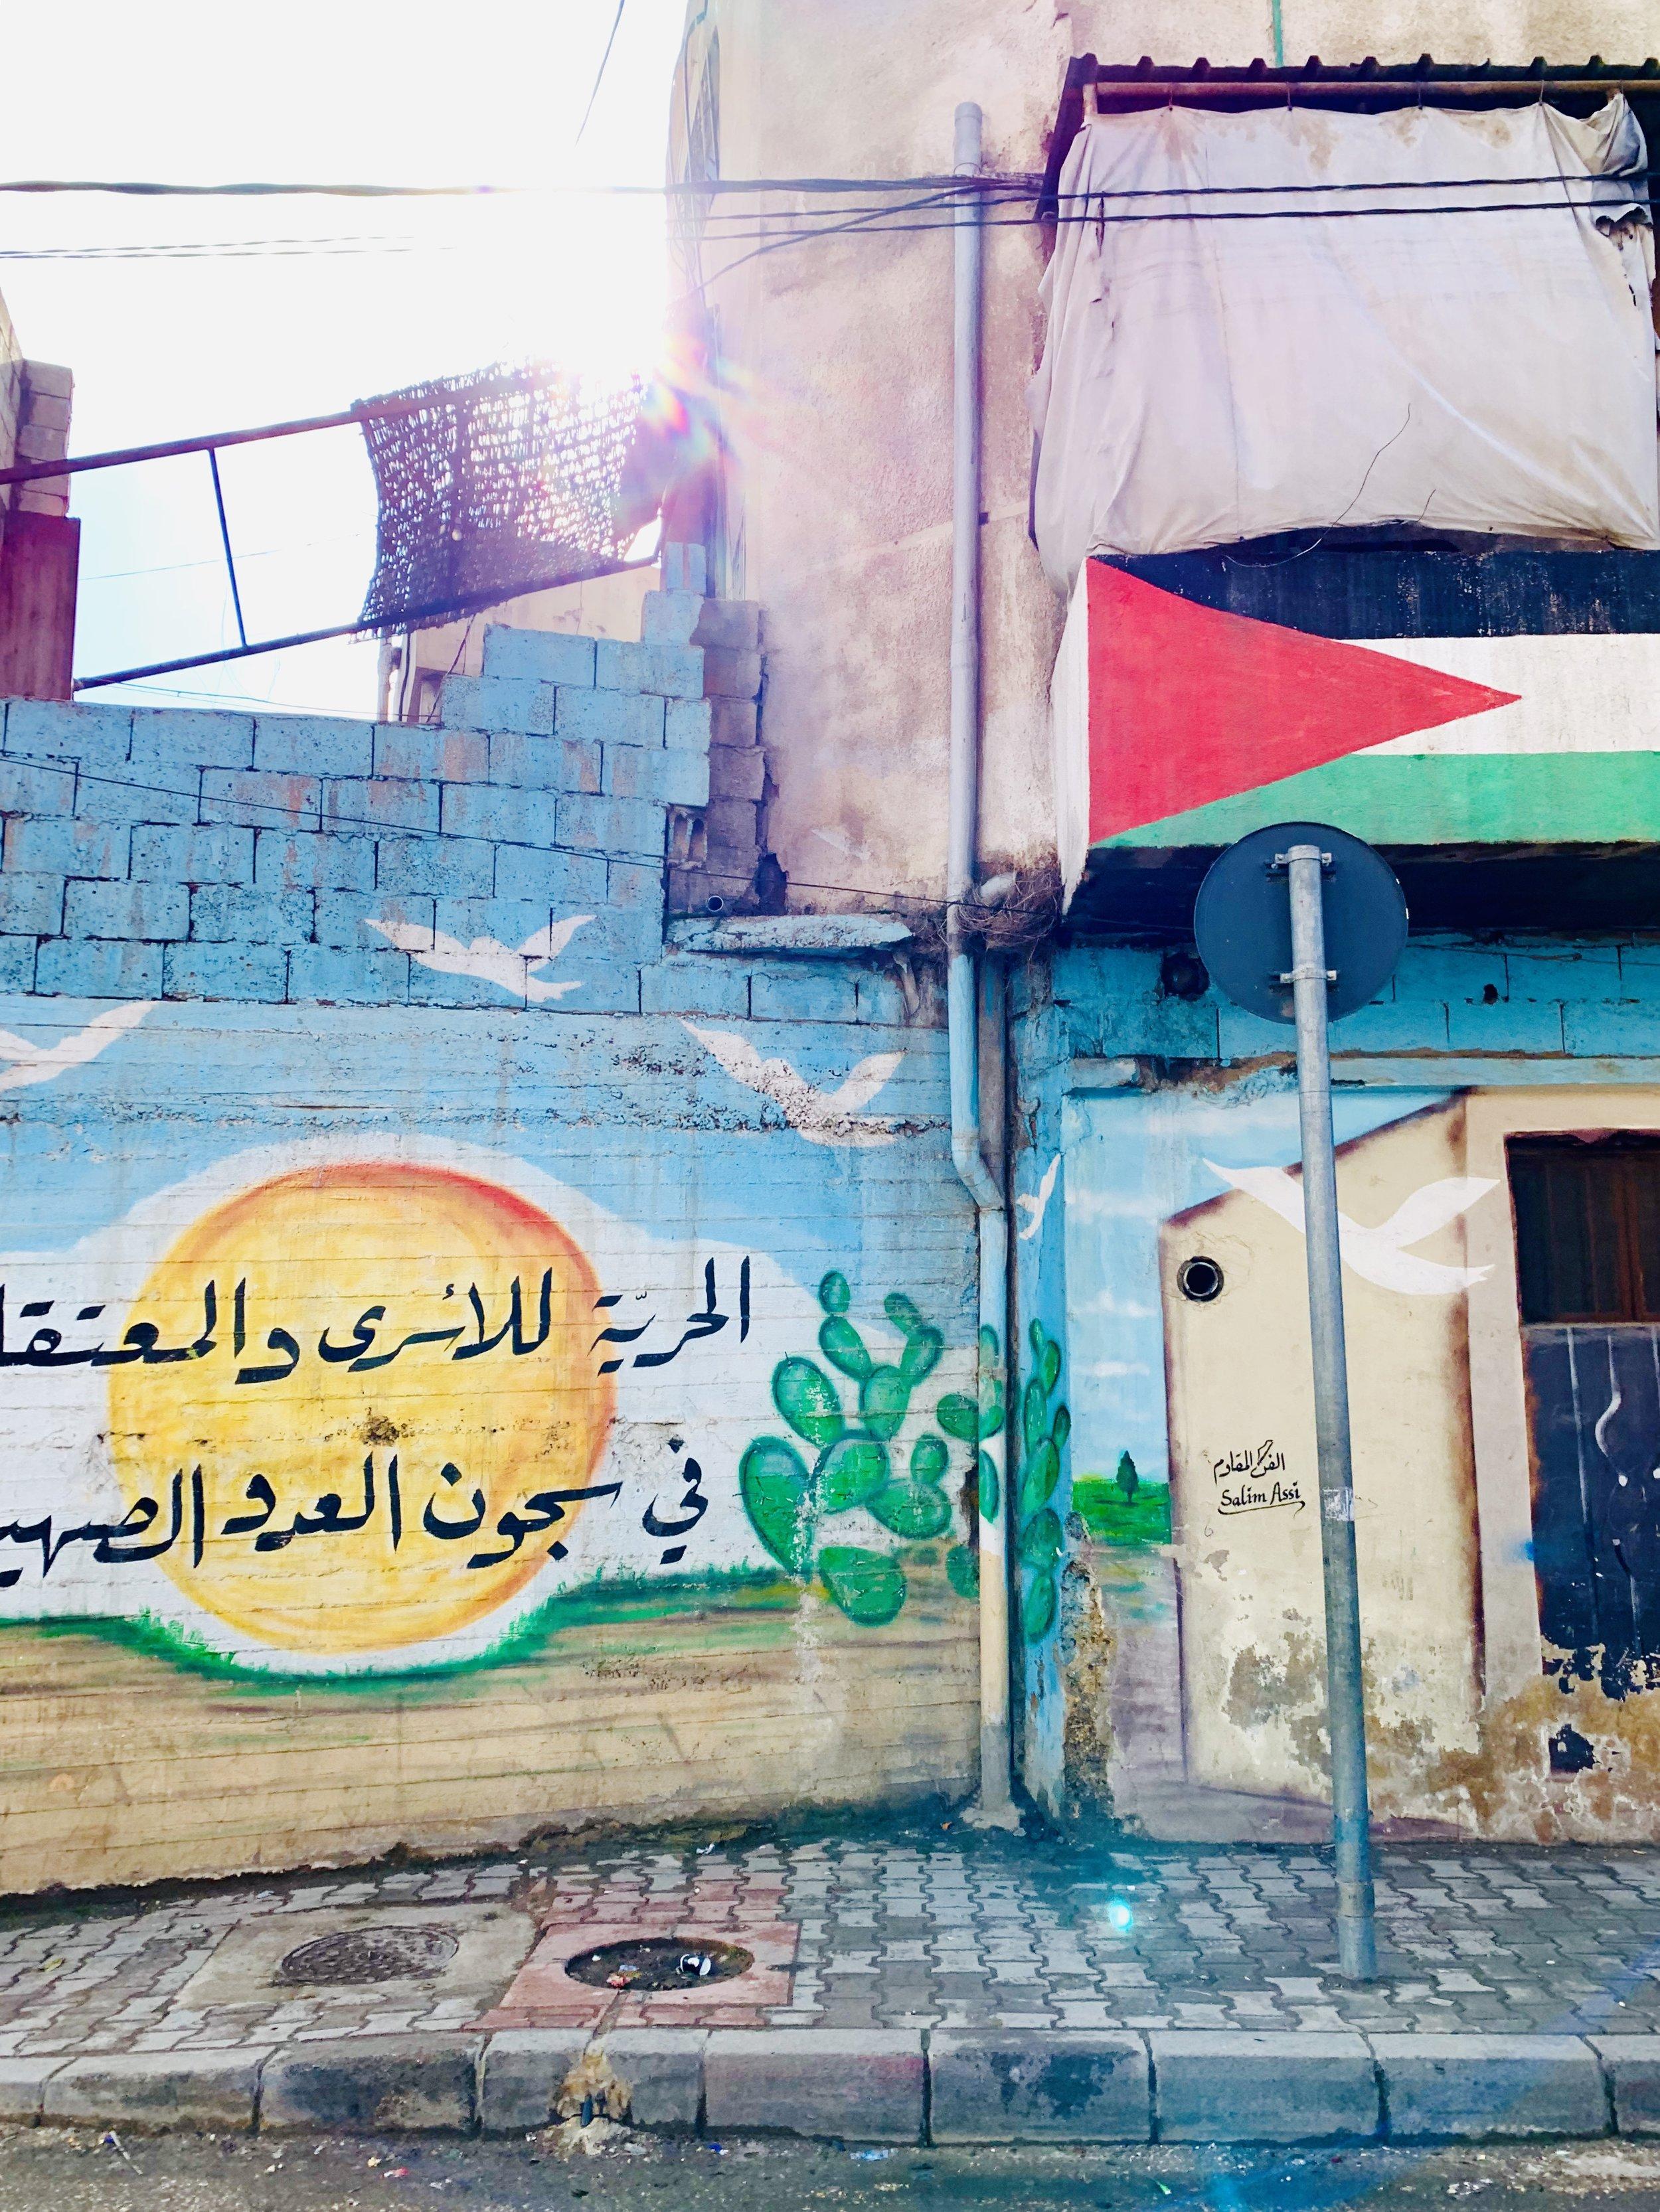 i libanesi amano esprimersi coi graffiti!